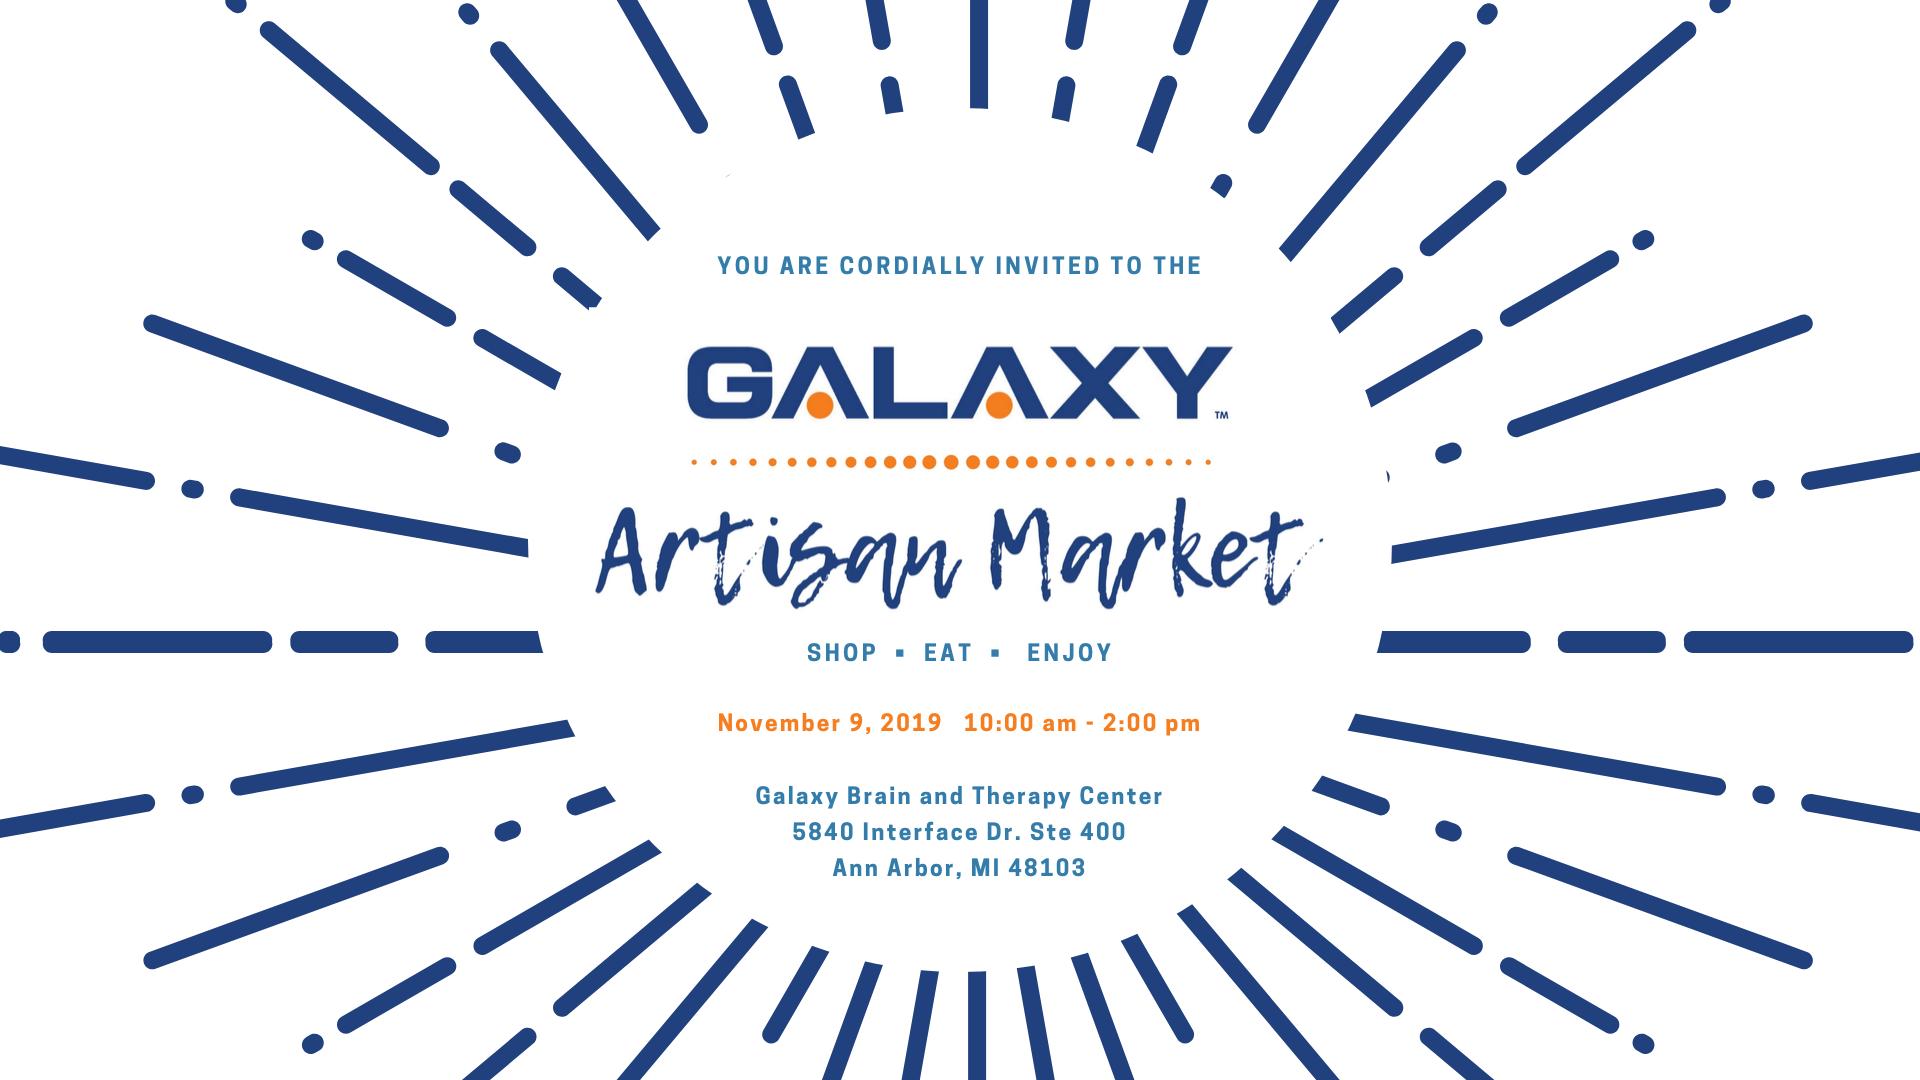 Galaxy Artisan Market 2019